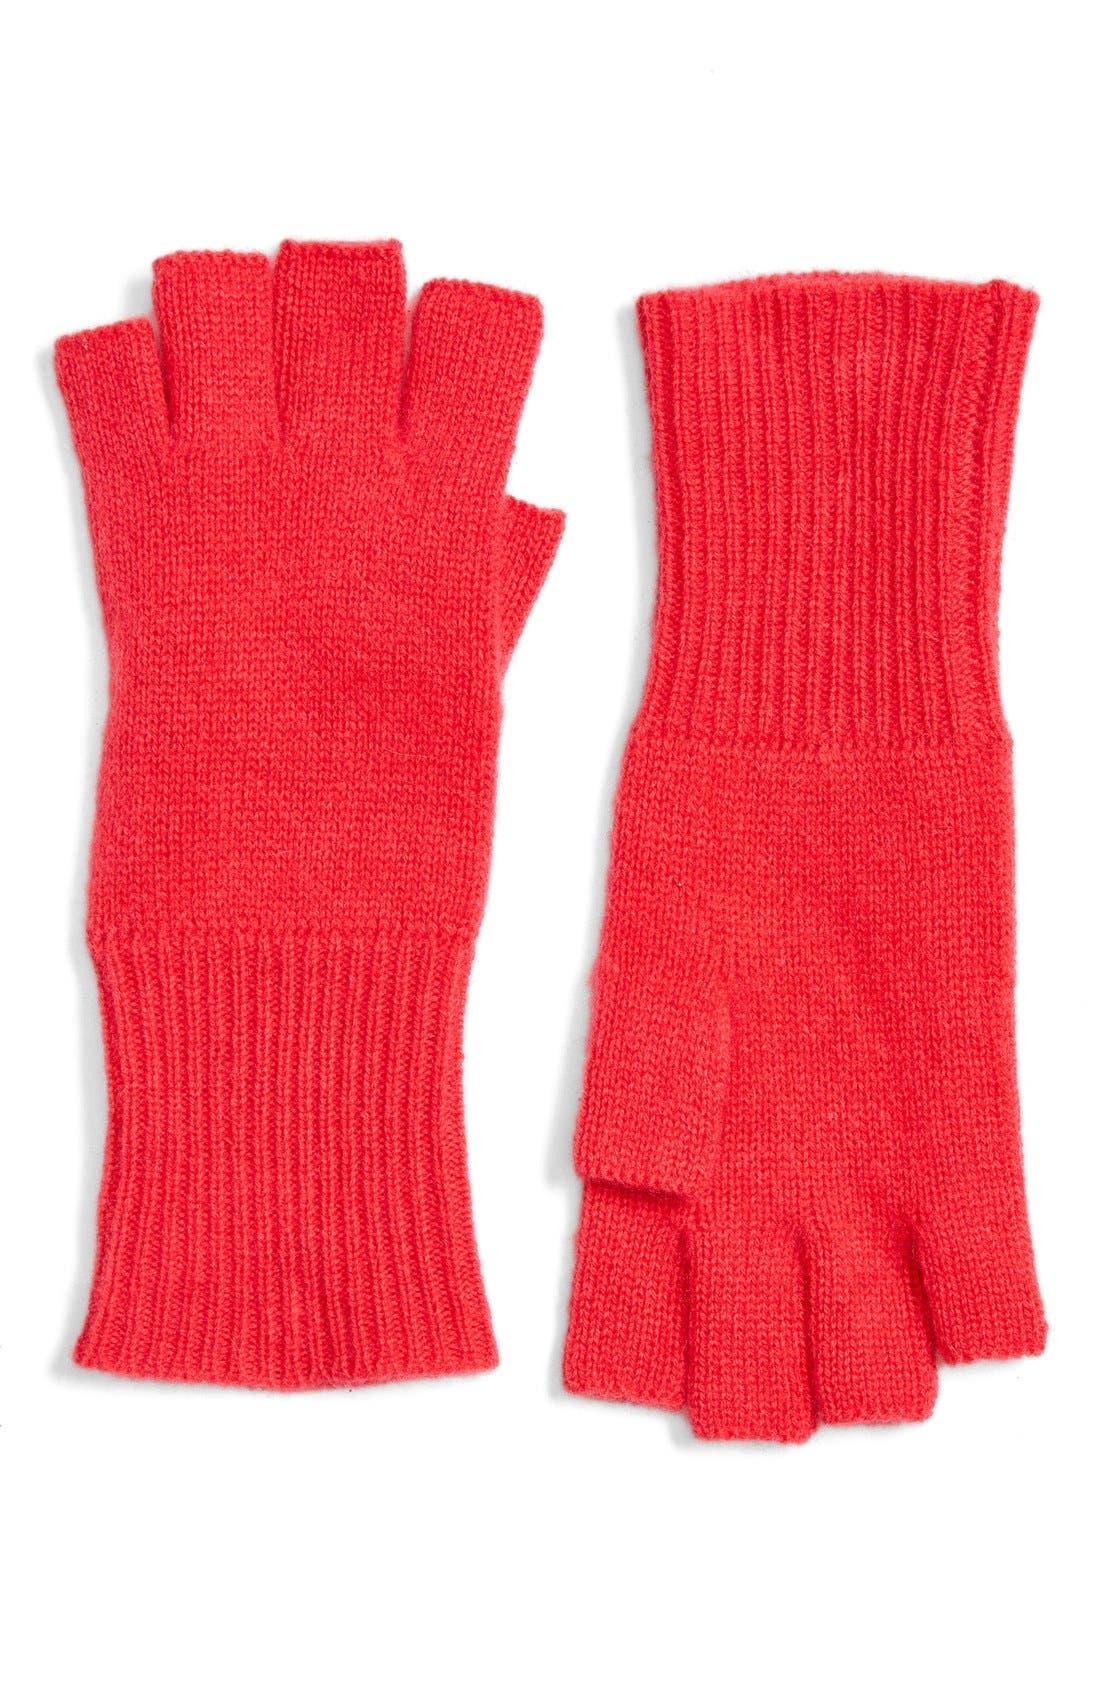 Alternate Image 1 Selected - Halogen® Cashmere Fingerless Gloves